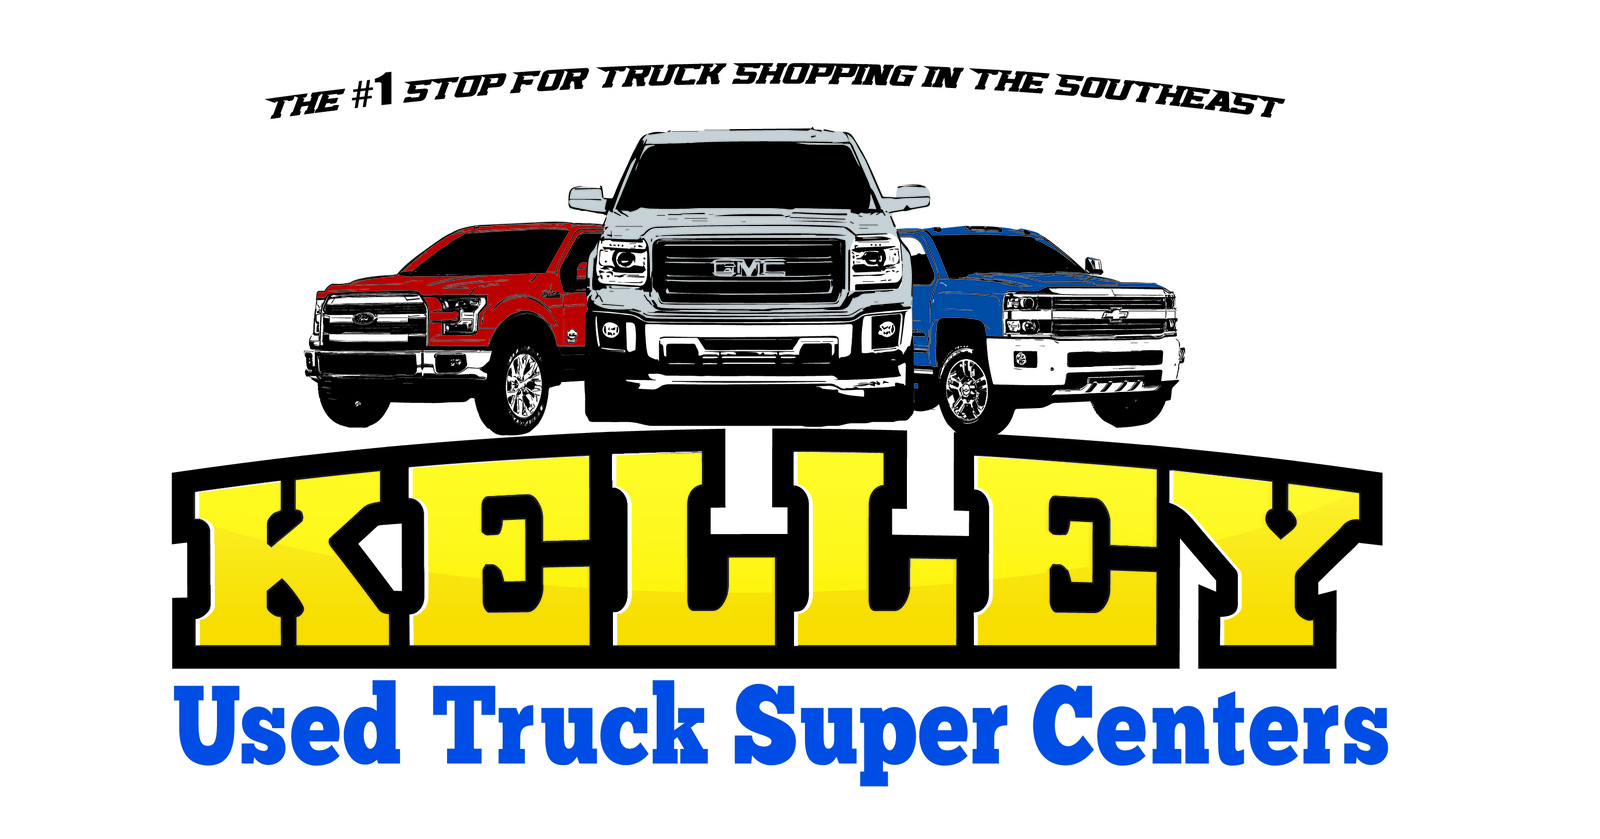 Kelley Used Truck Super Centers - Lakeland, FL: Read Consumer ...